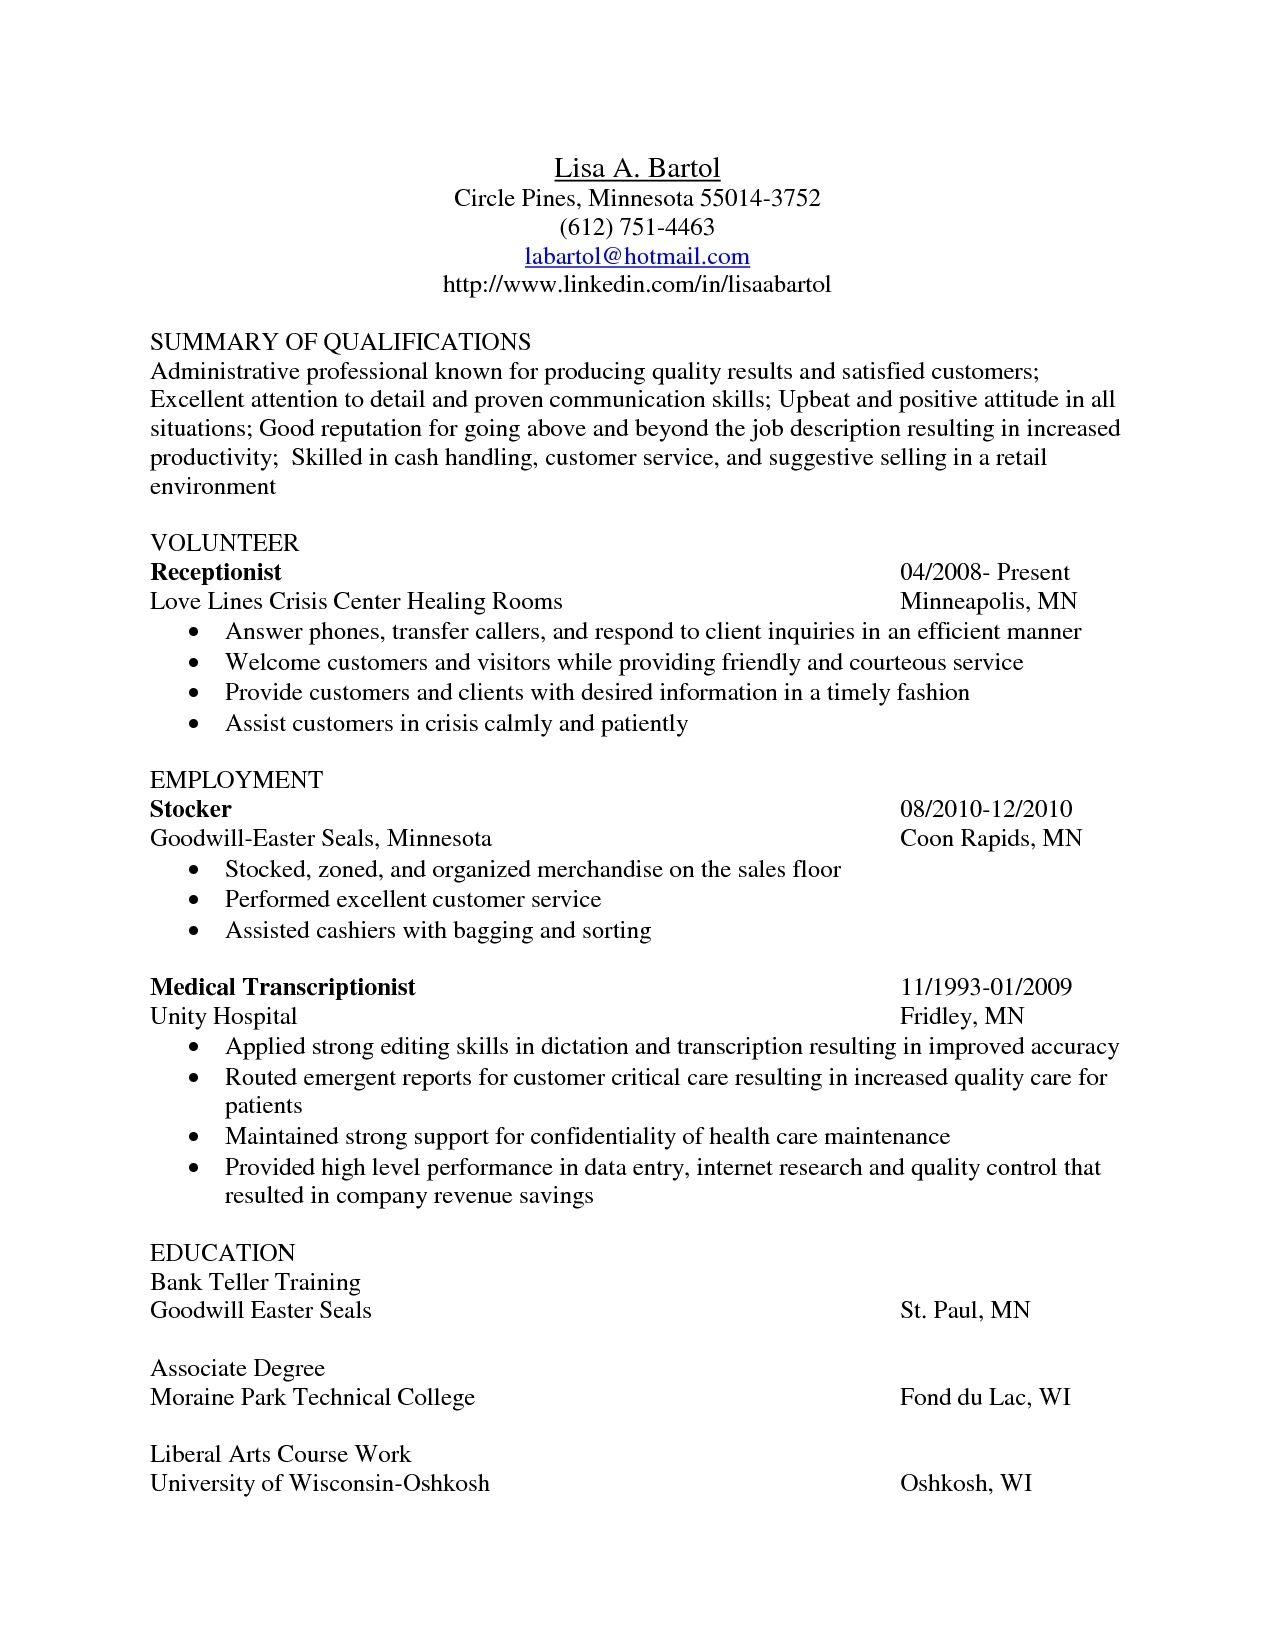 Awesome Medical Transcription Resume Samples Format Web Transcriptionist Sample No Experience Cover Letter Entry Le Medical Transcription Essay Template Resume